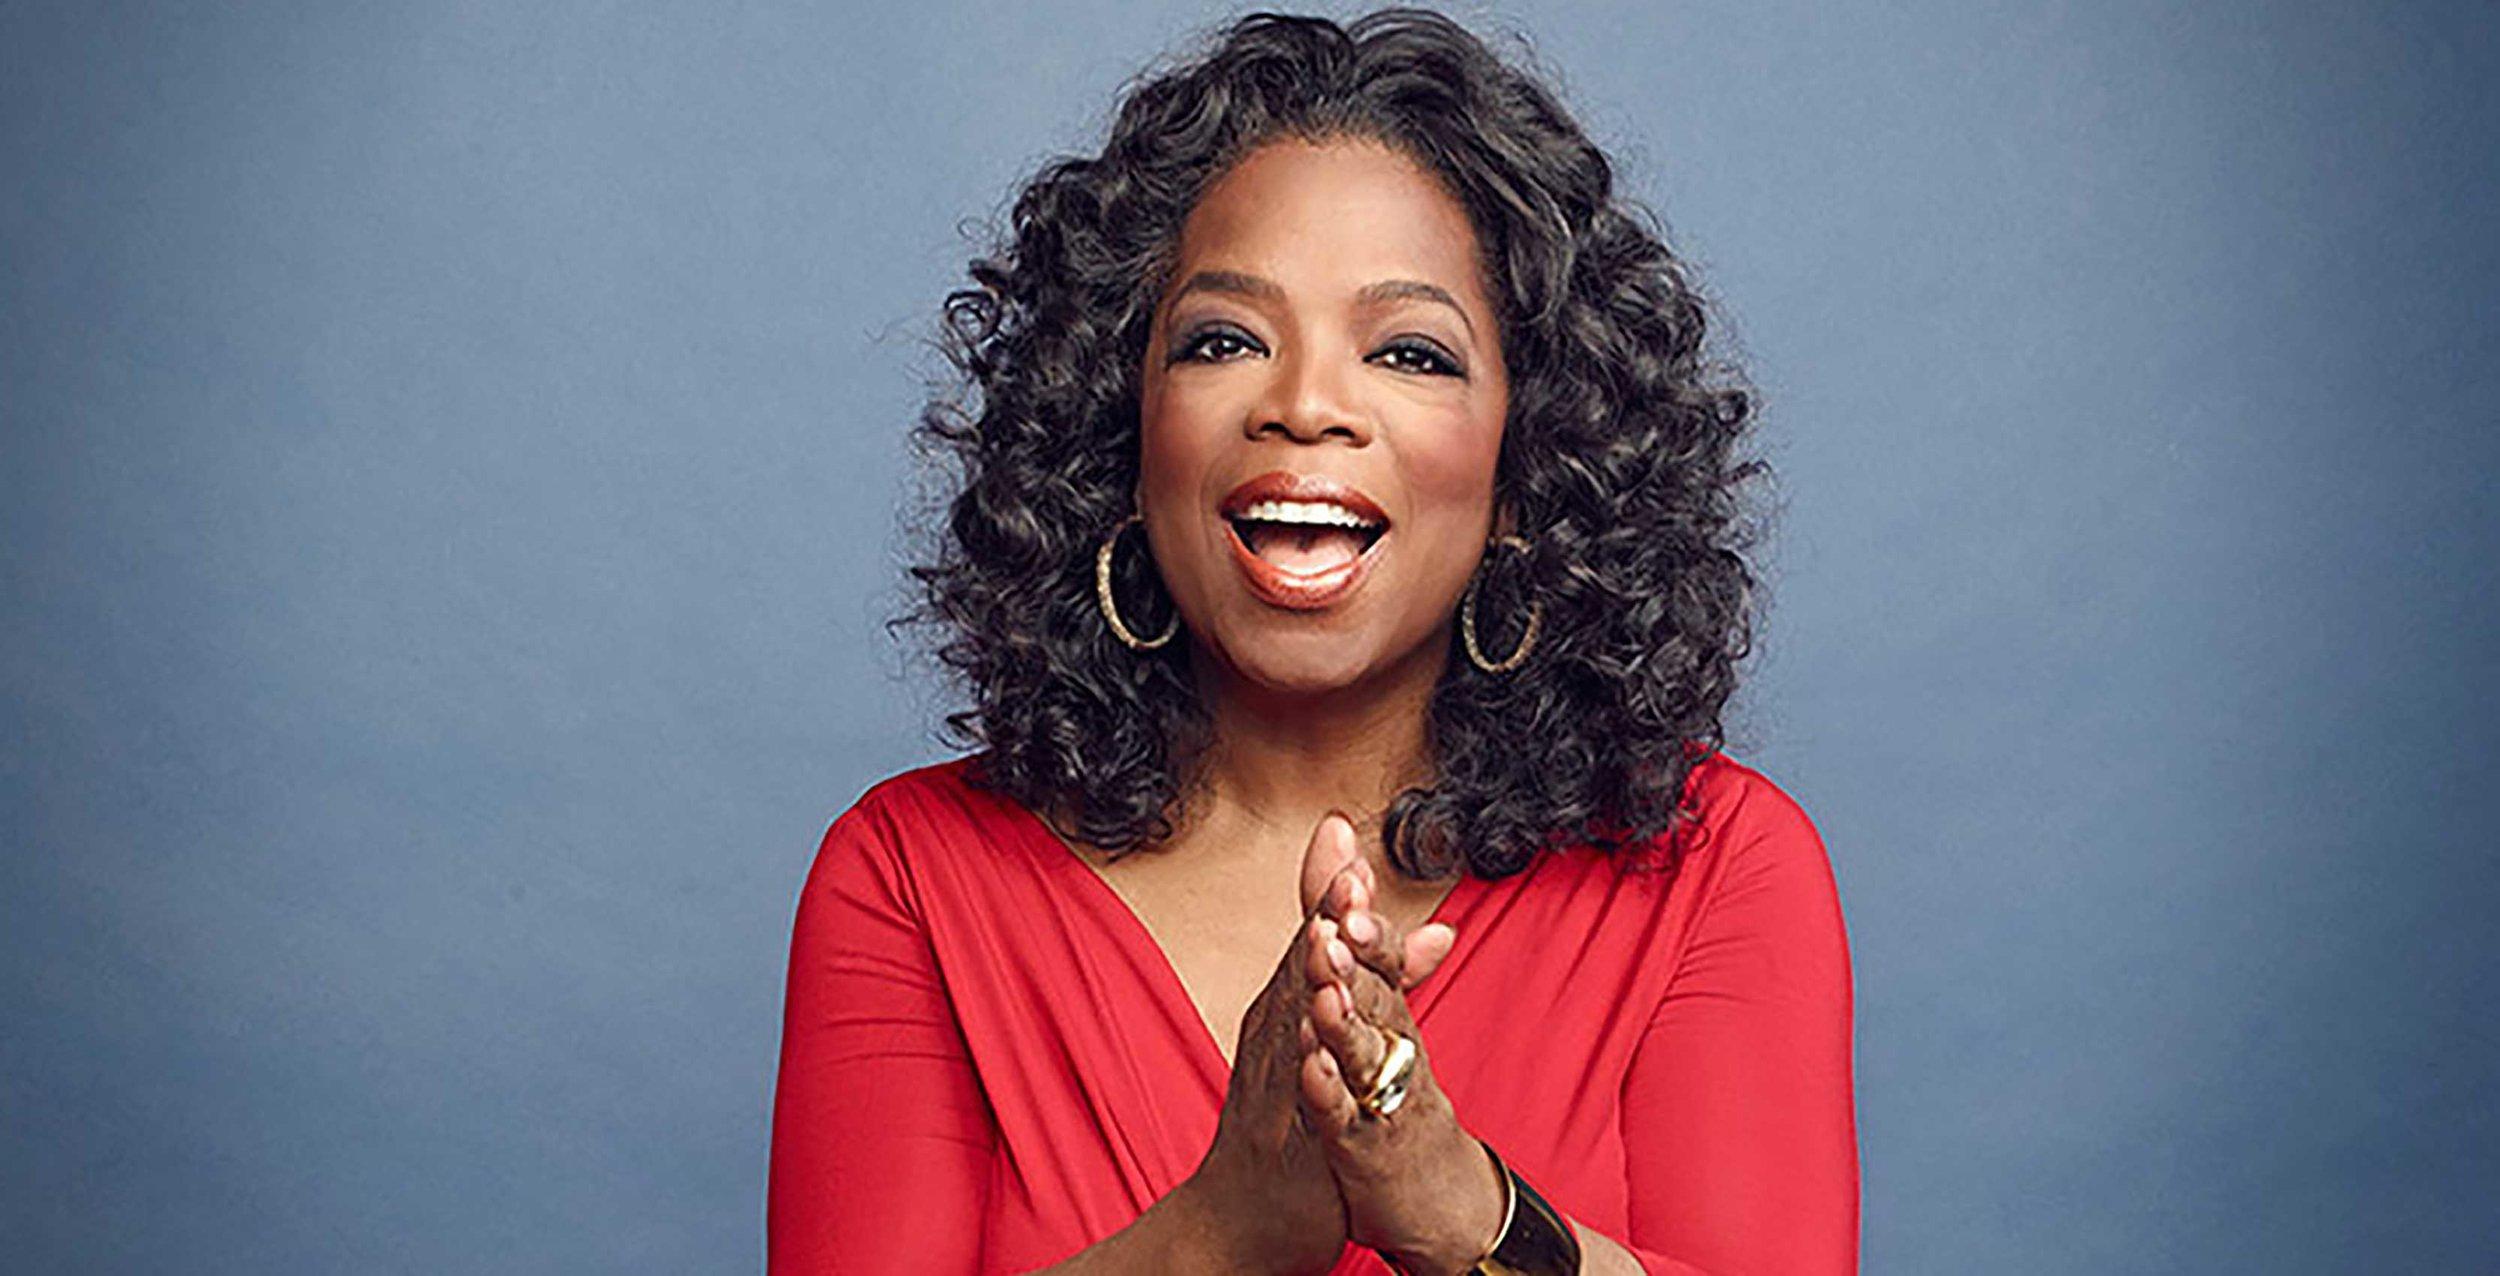 Photo by Oprah.com